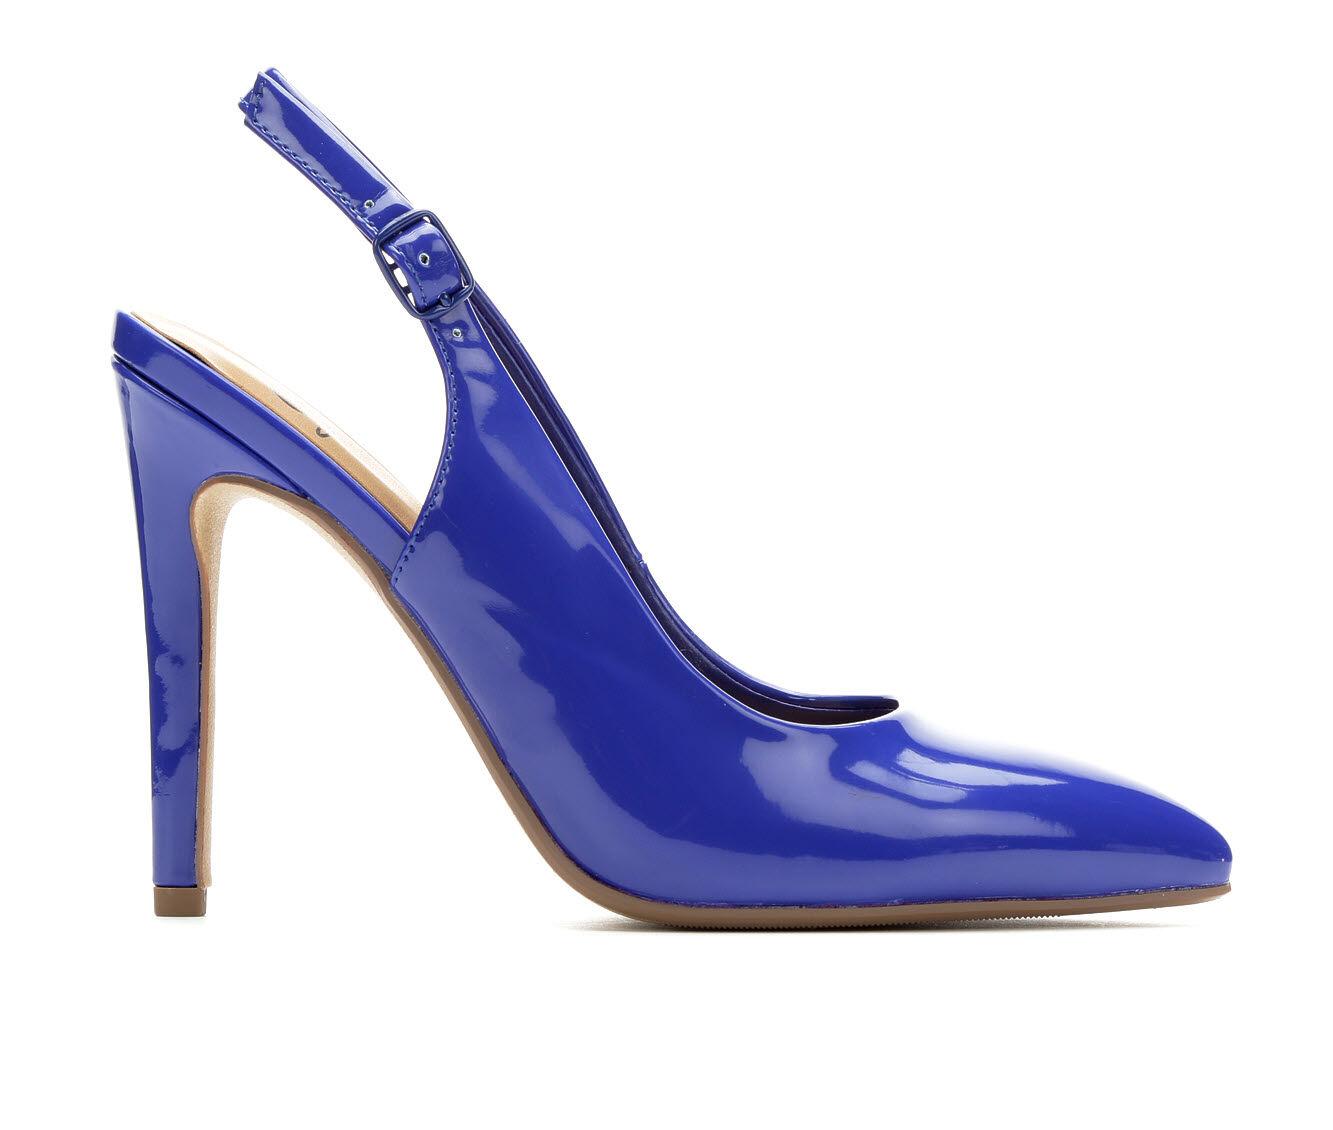 uk shoes_kd6210